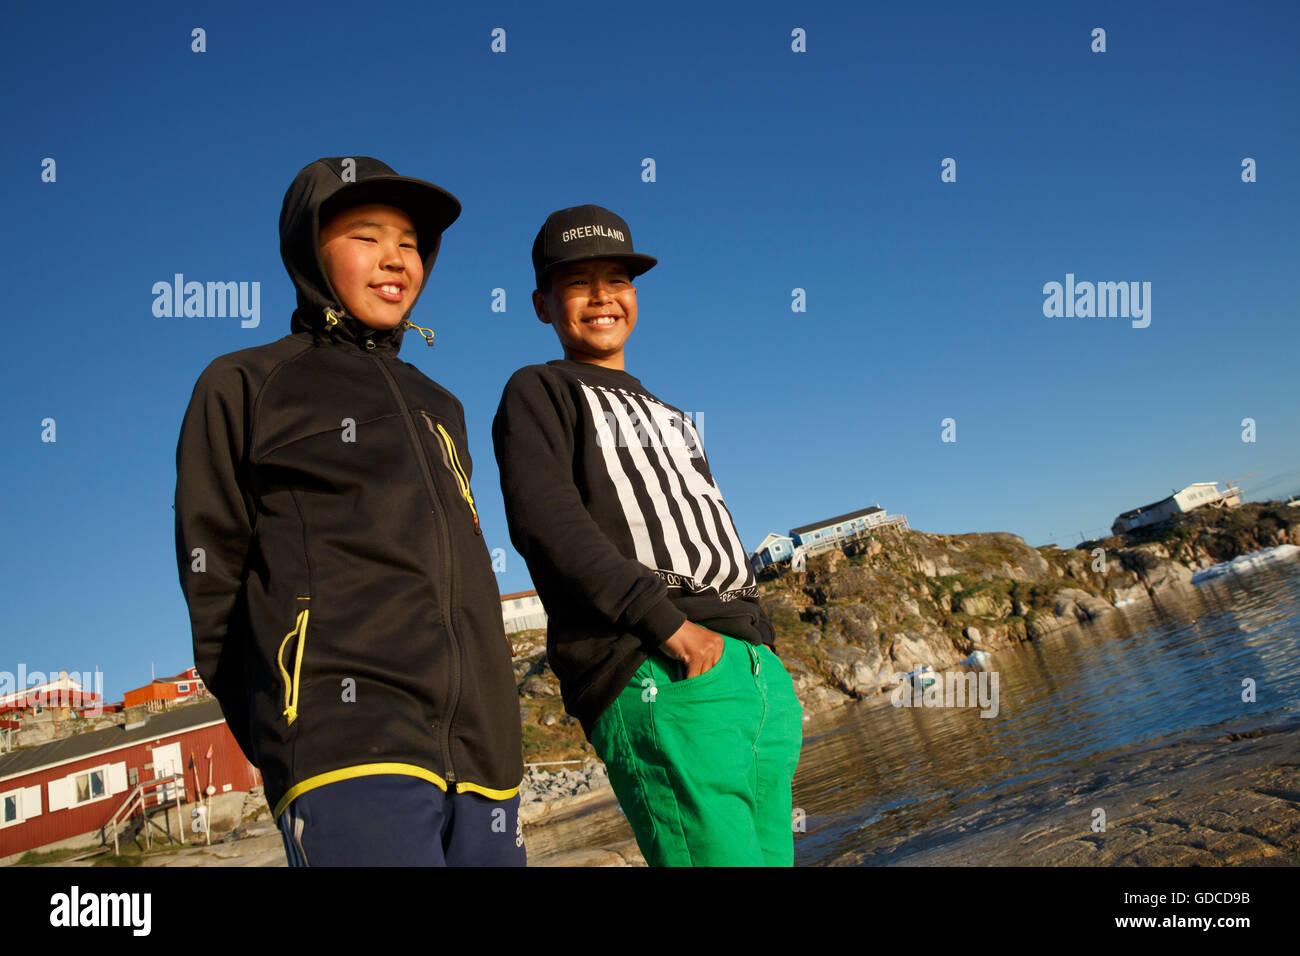 Inuit boys on the shore, Ilulissat, Greenland - Stock Image